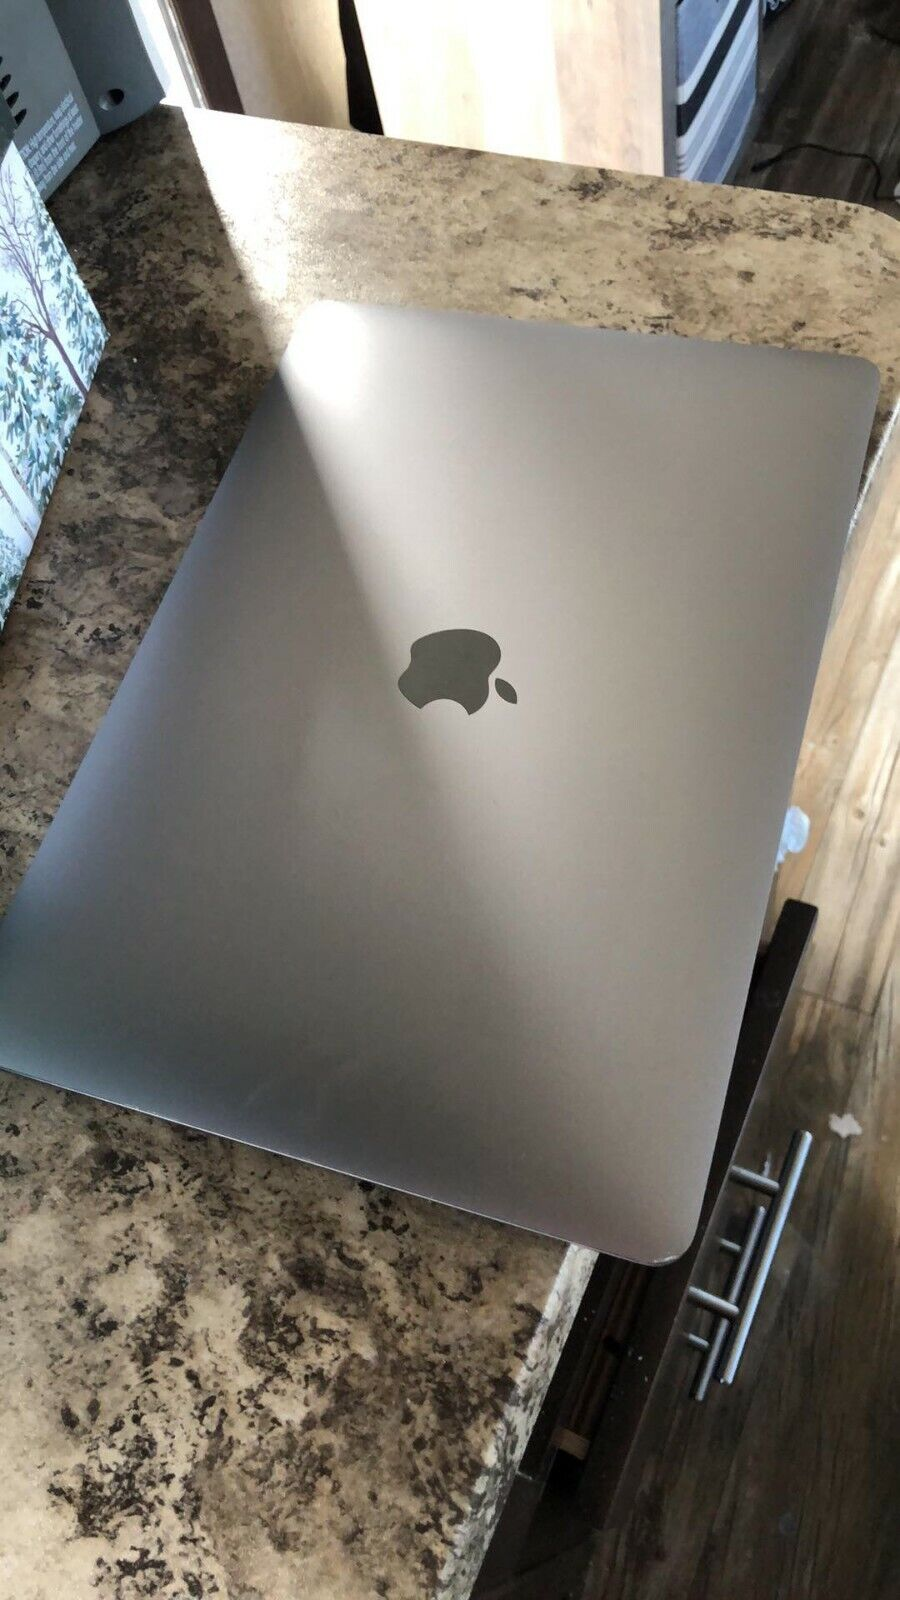 Apple MacBook Air 13 Inch Space Gray 10th Gen i5 256GB Z0YJ0